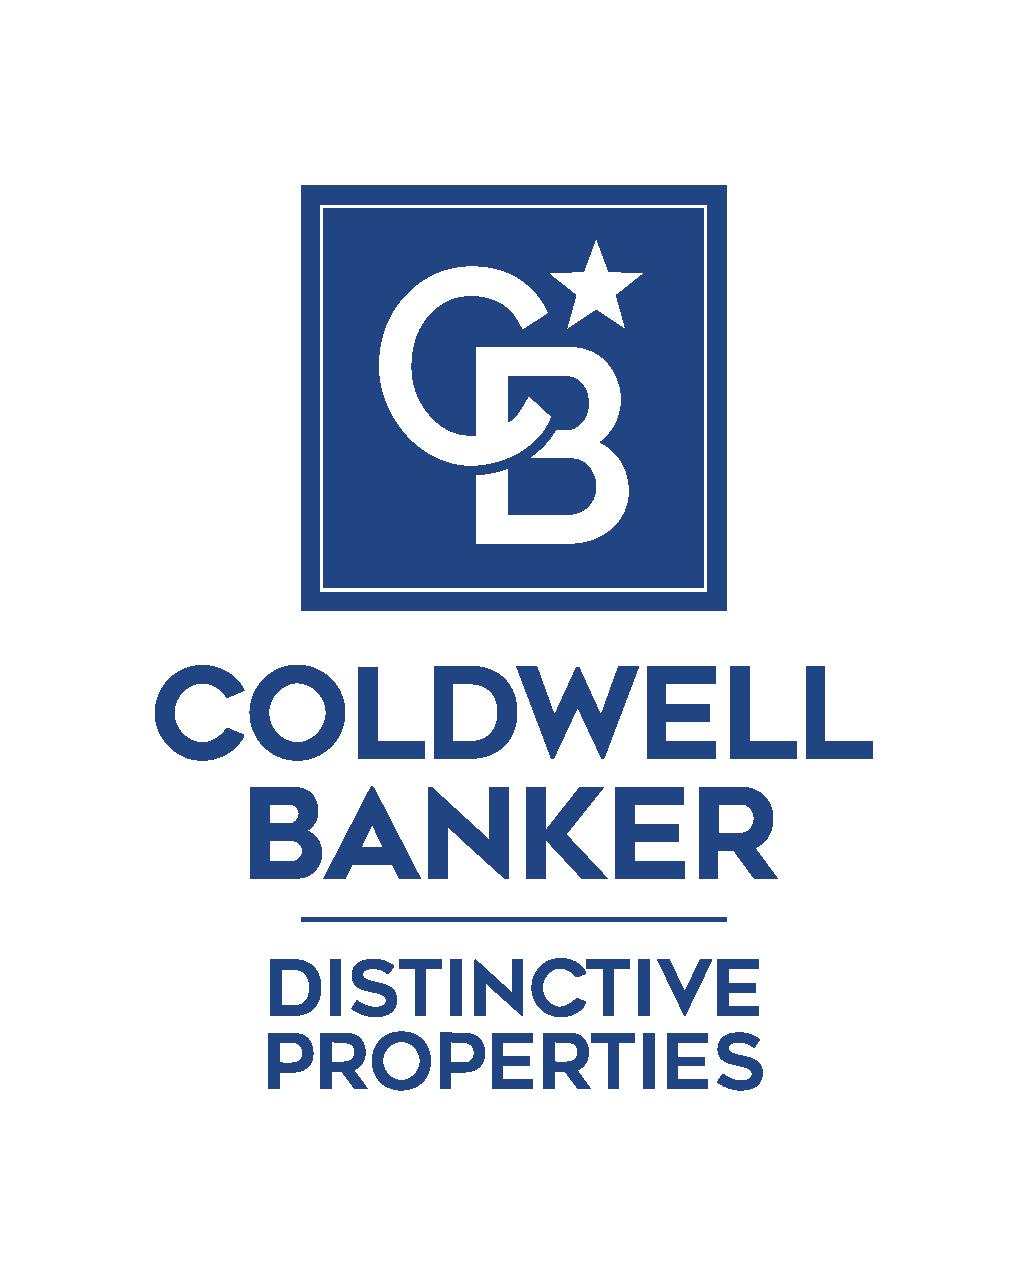 Linda Virgin - Coldwell Banker Distinctive Properties Logo